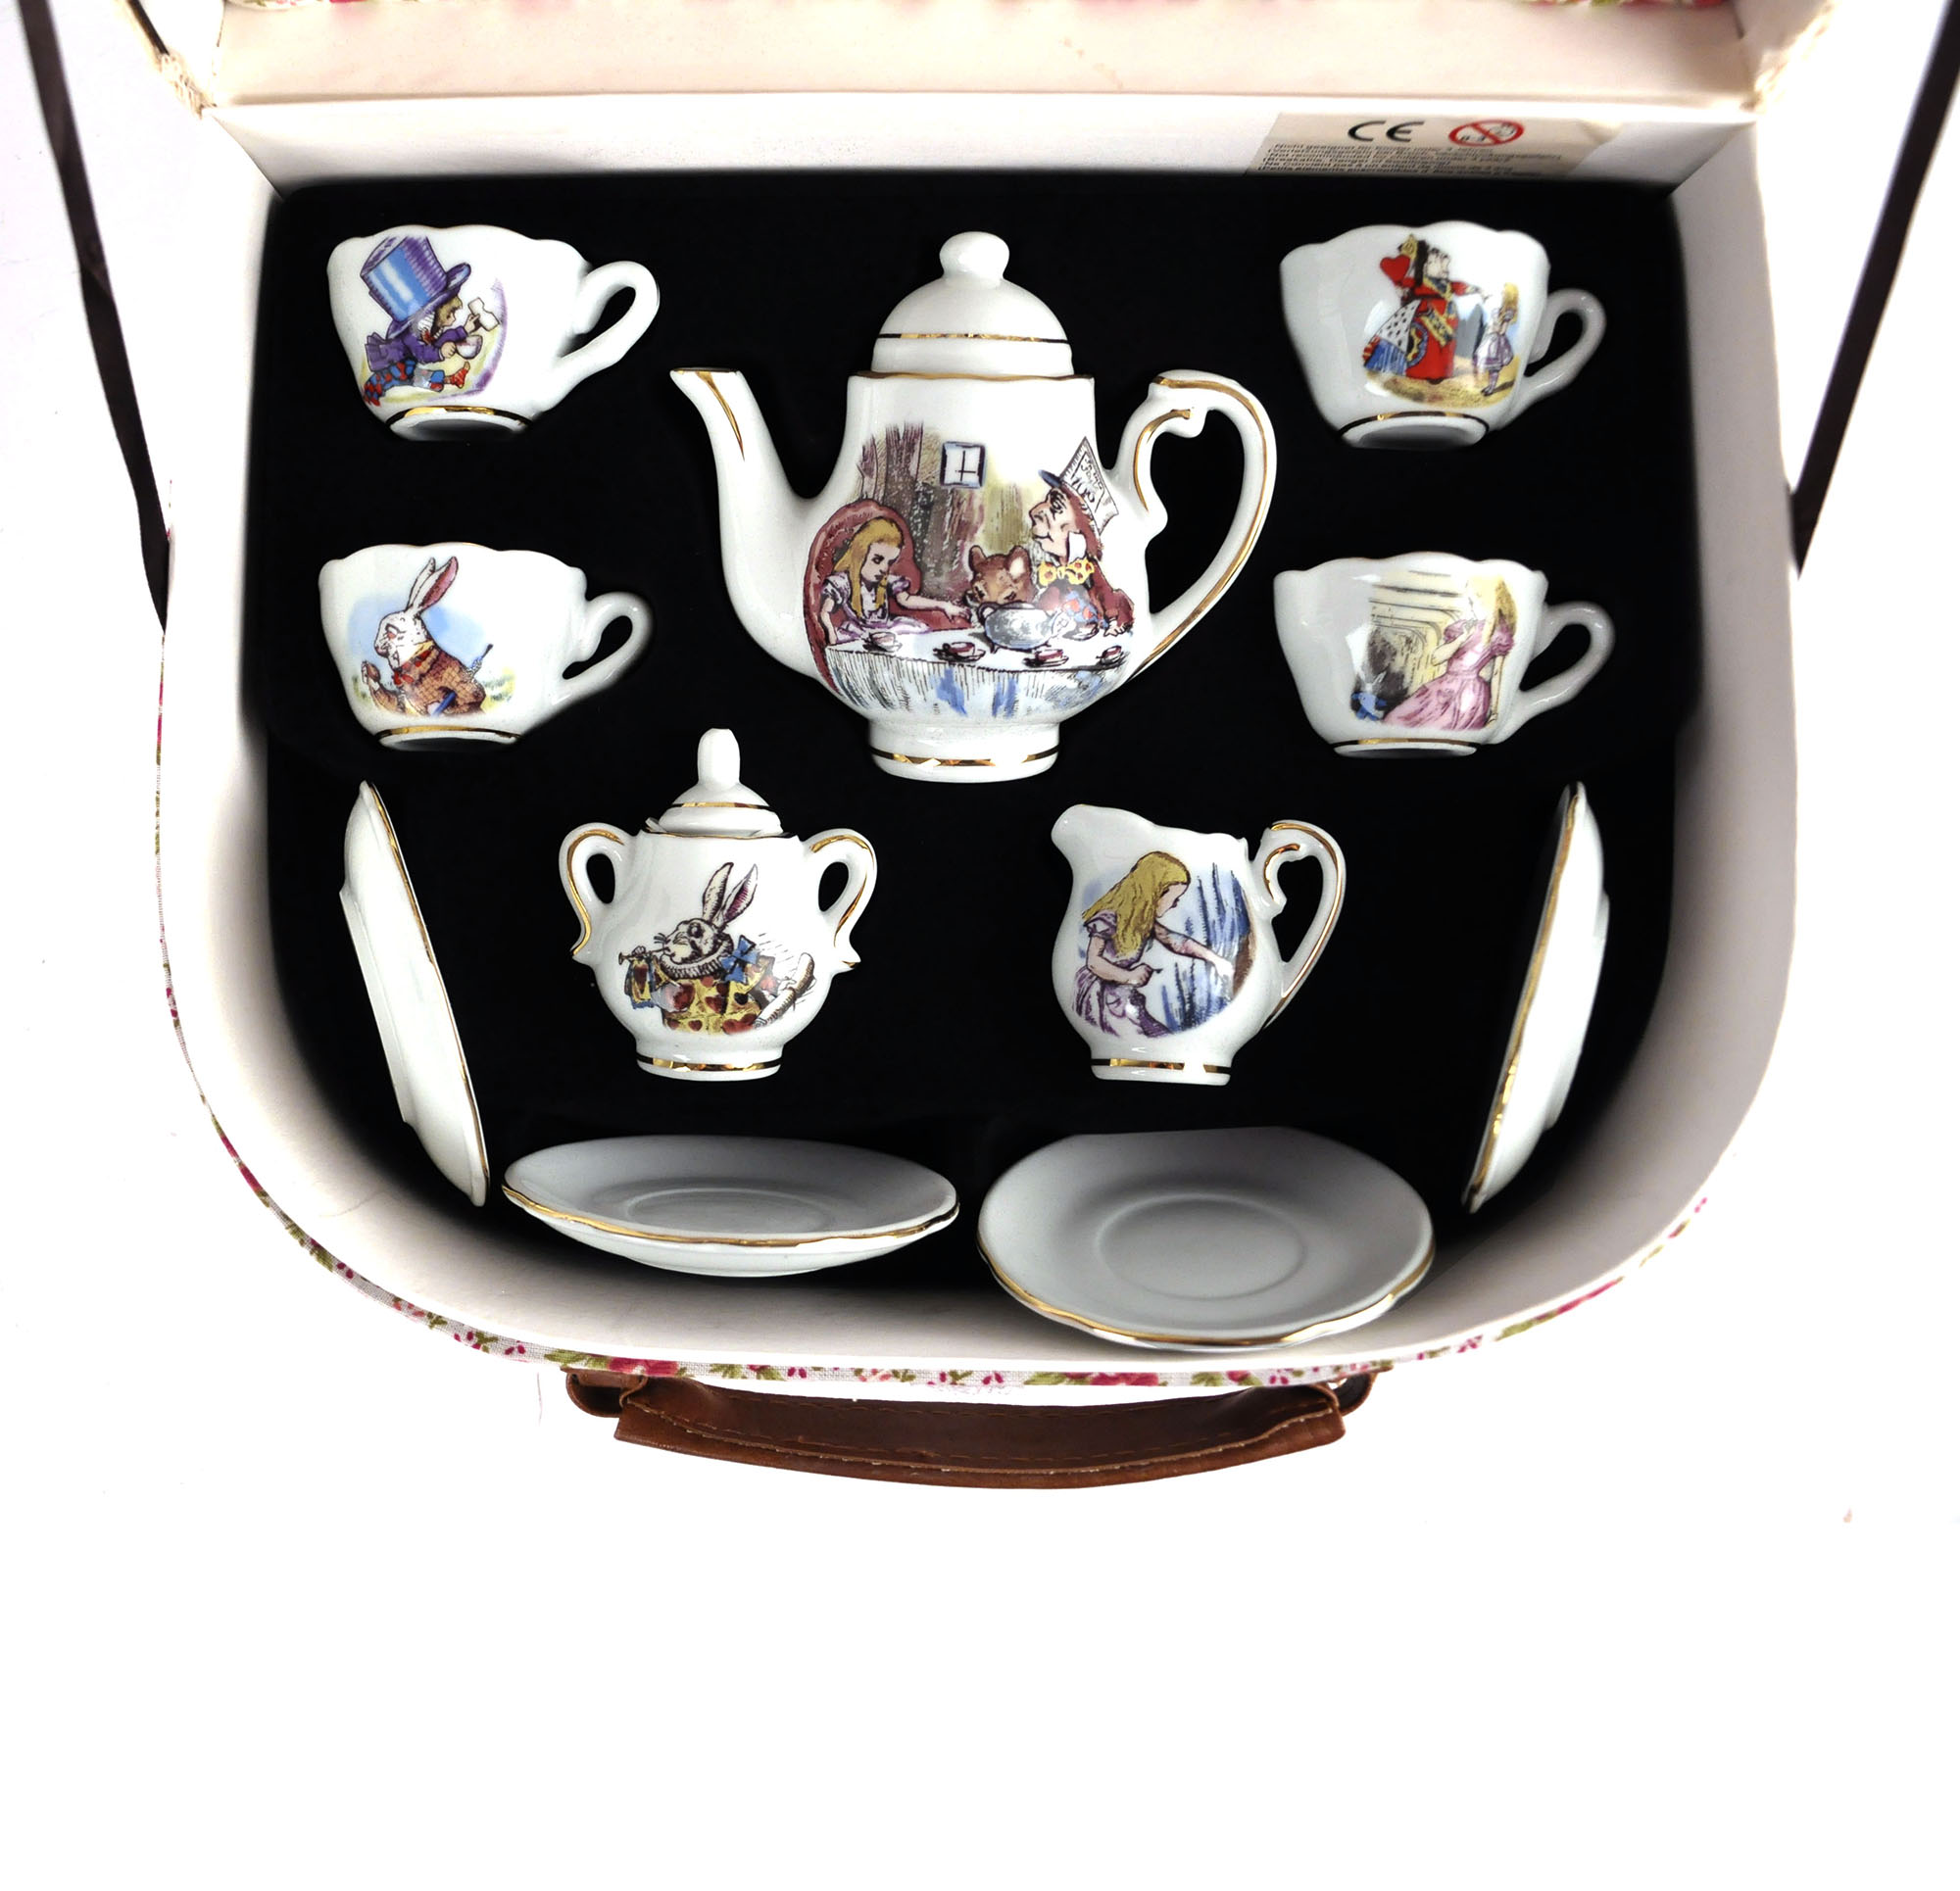 Alice in wonderland tea set-5270